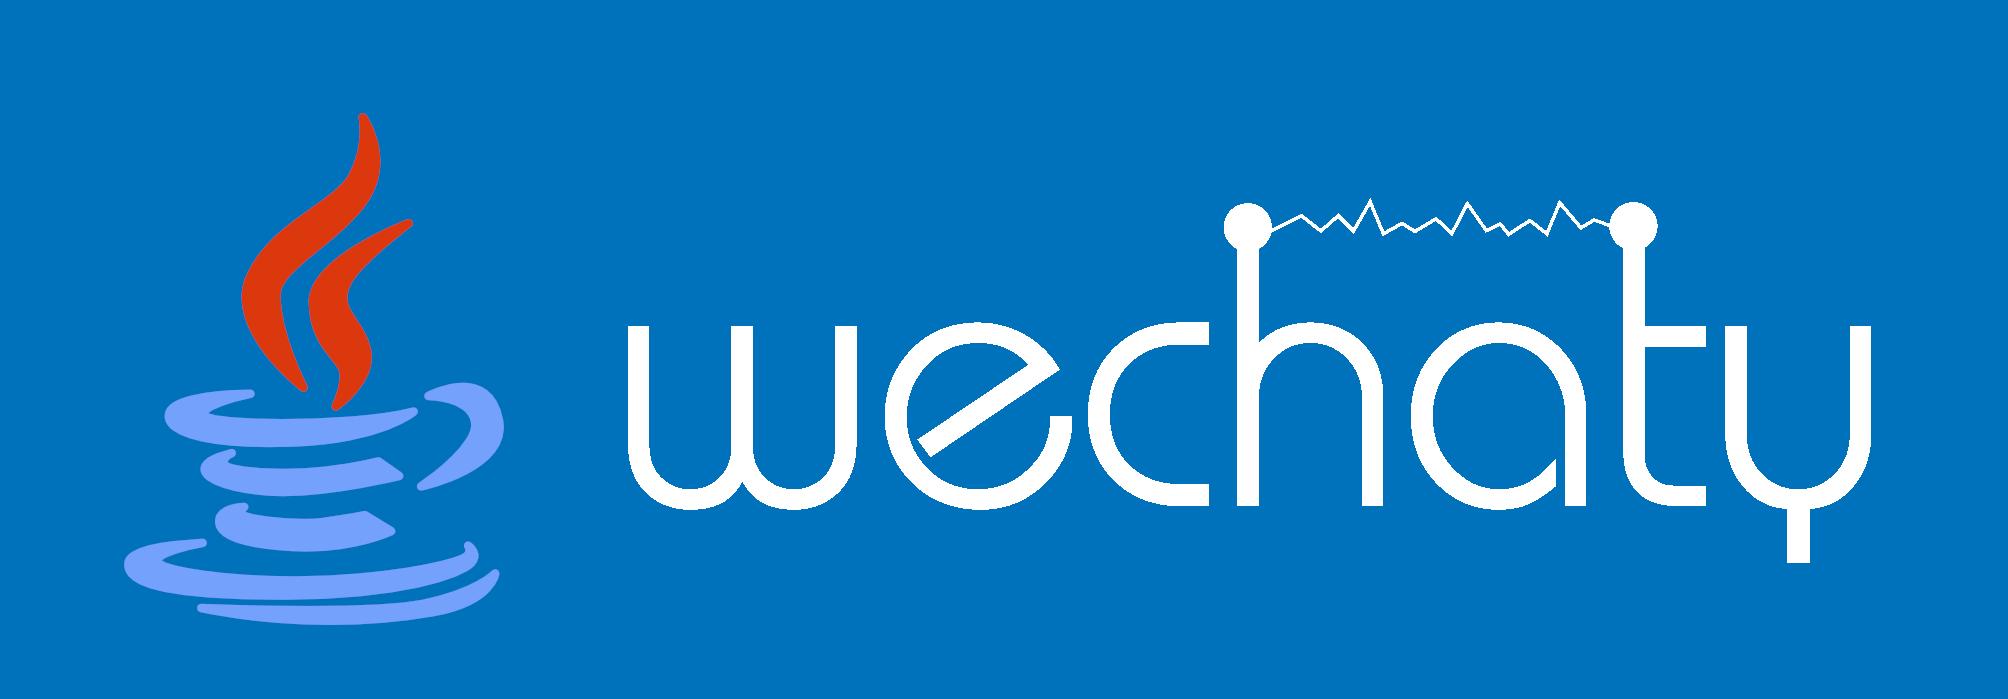 java-wechaty